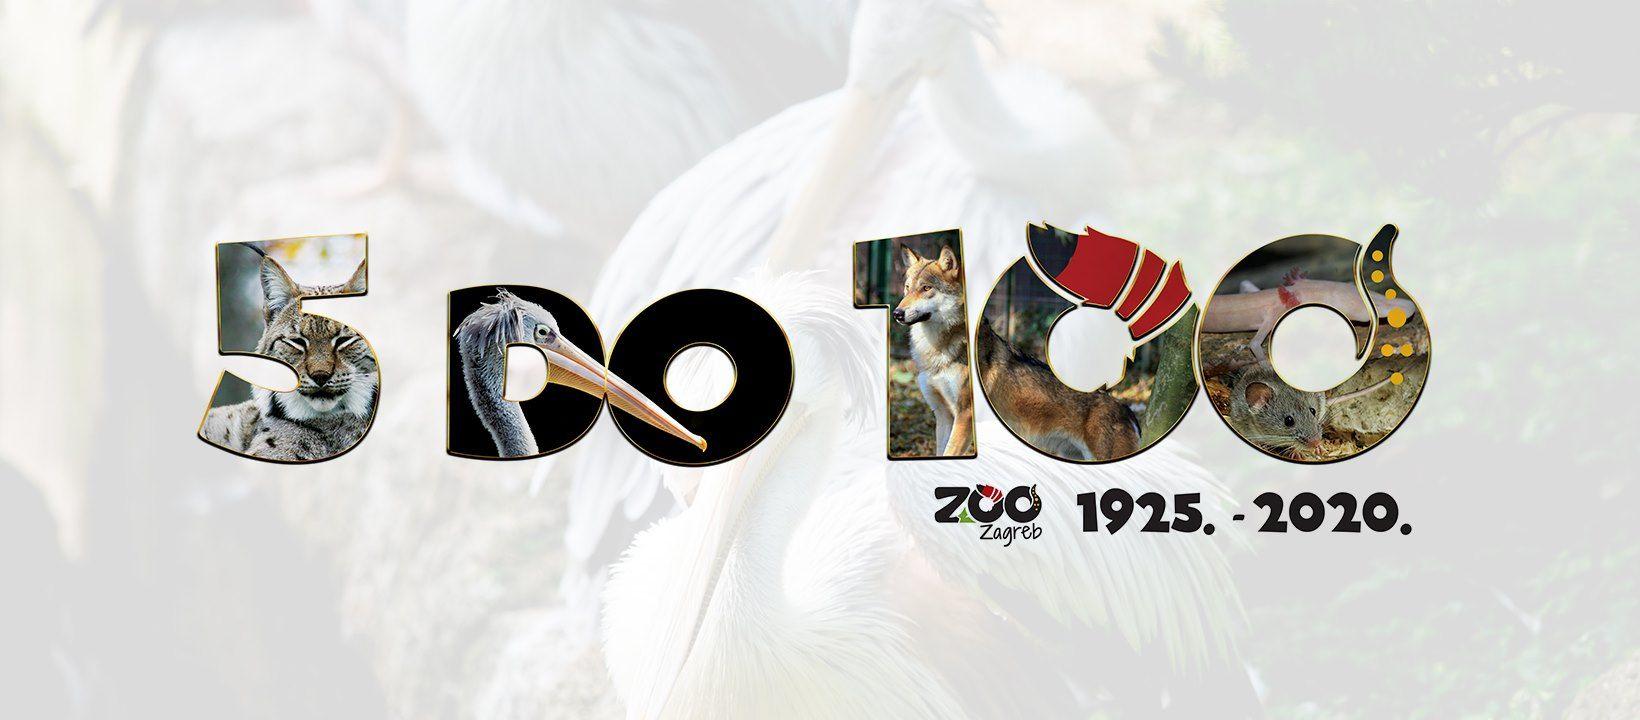 Proslava rođendana Zoološkog vrta grada Zagreba u znaku slogana '5 do 100'